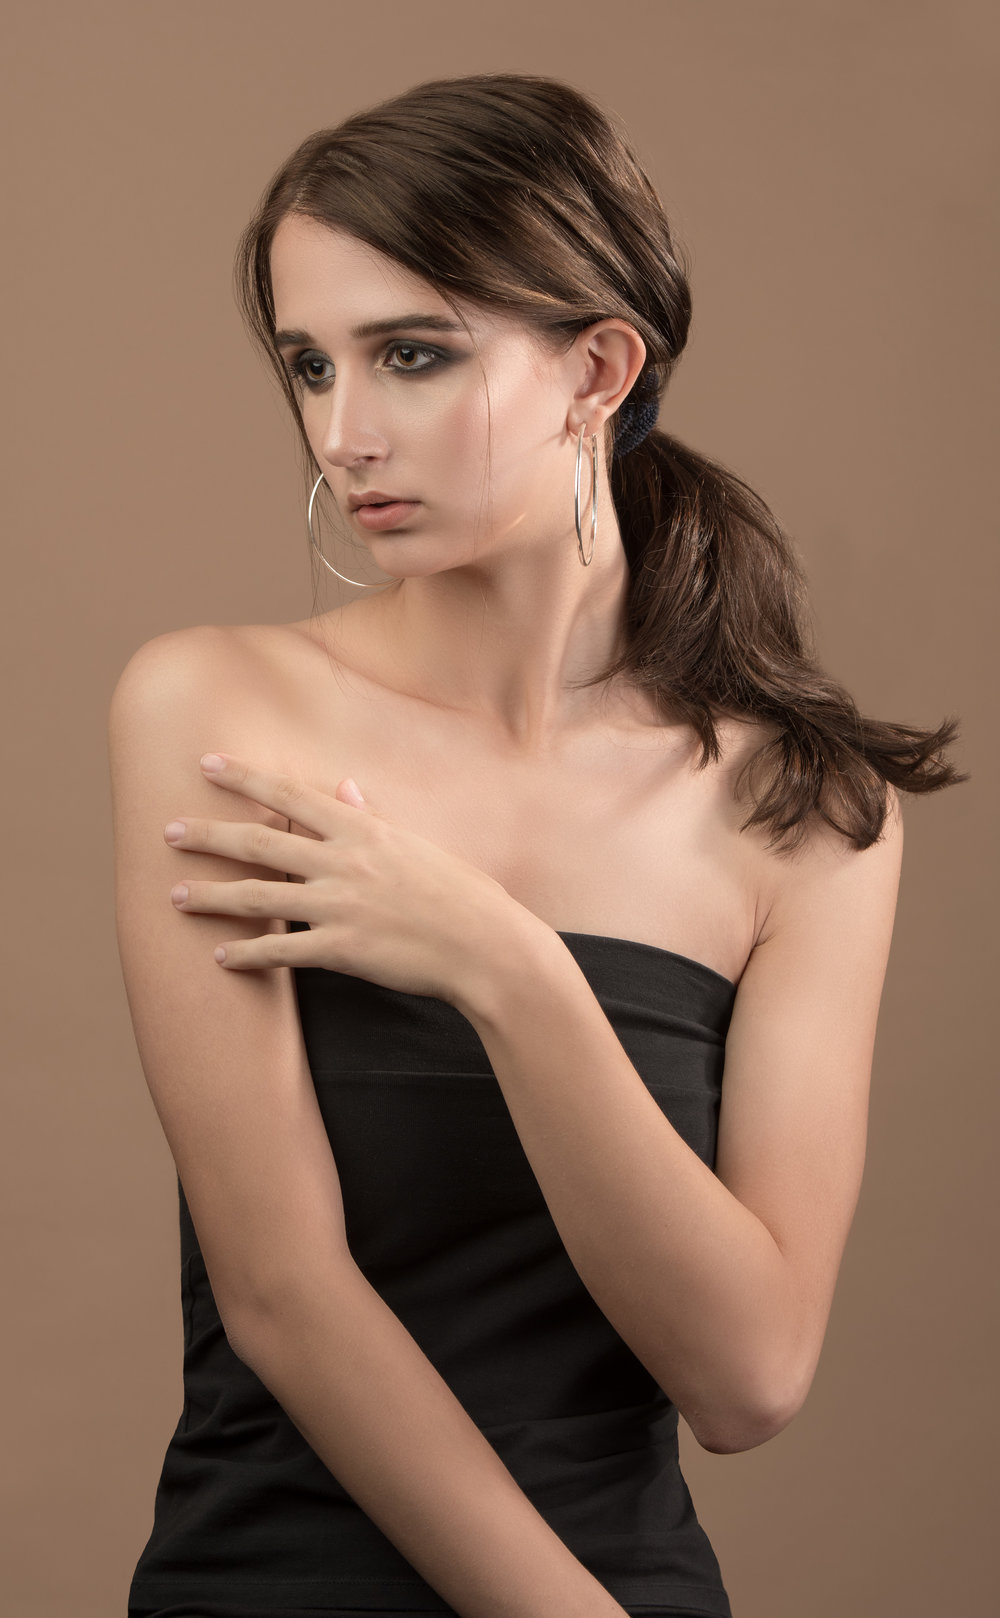 Studio Beauty Shoot #3